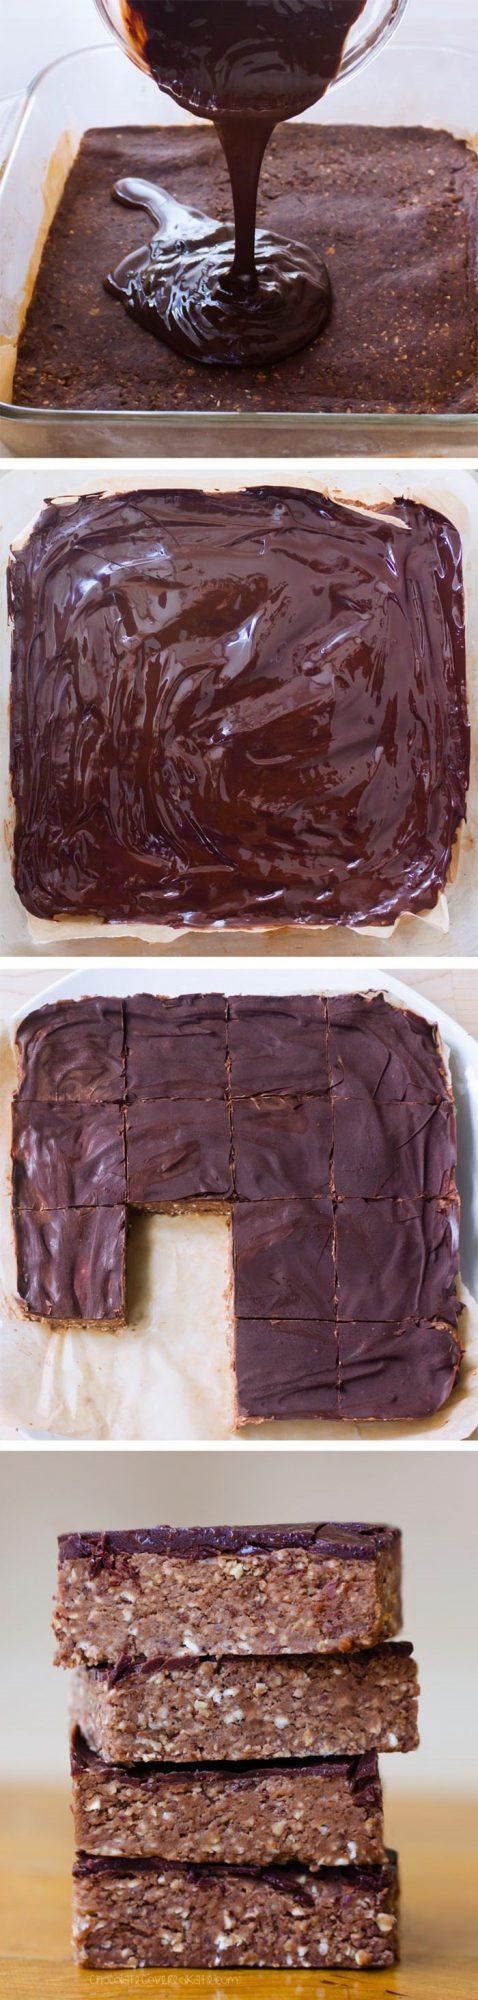 Chocolate Brownie Breakfast Bars